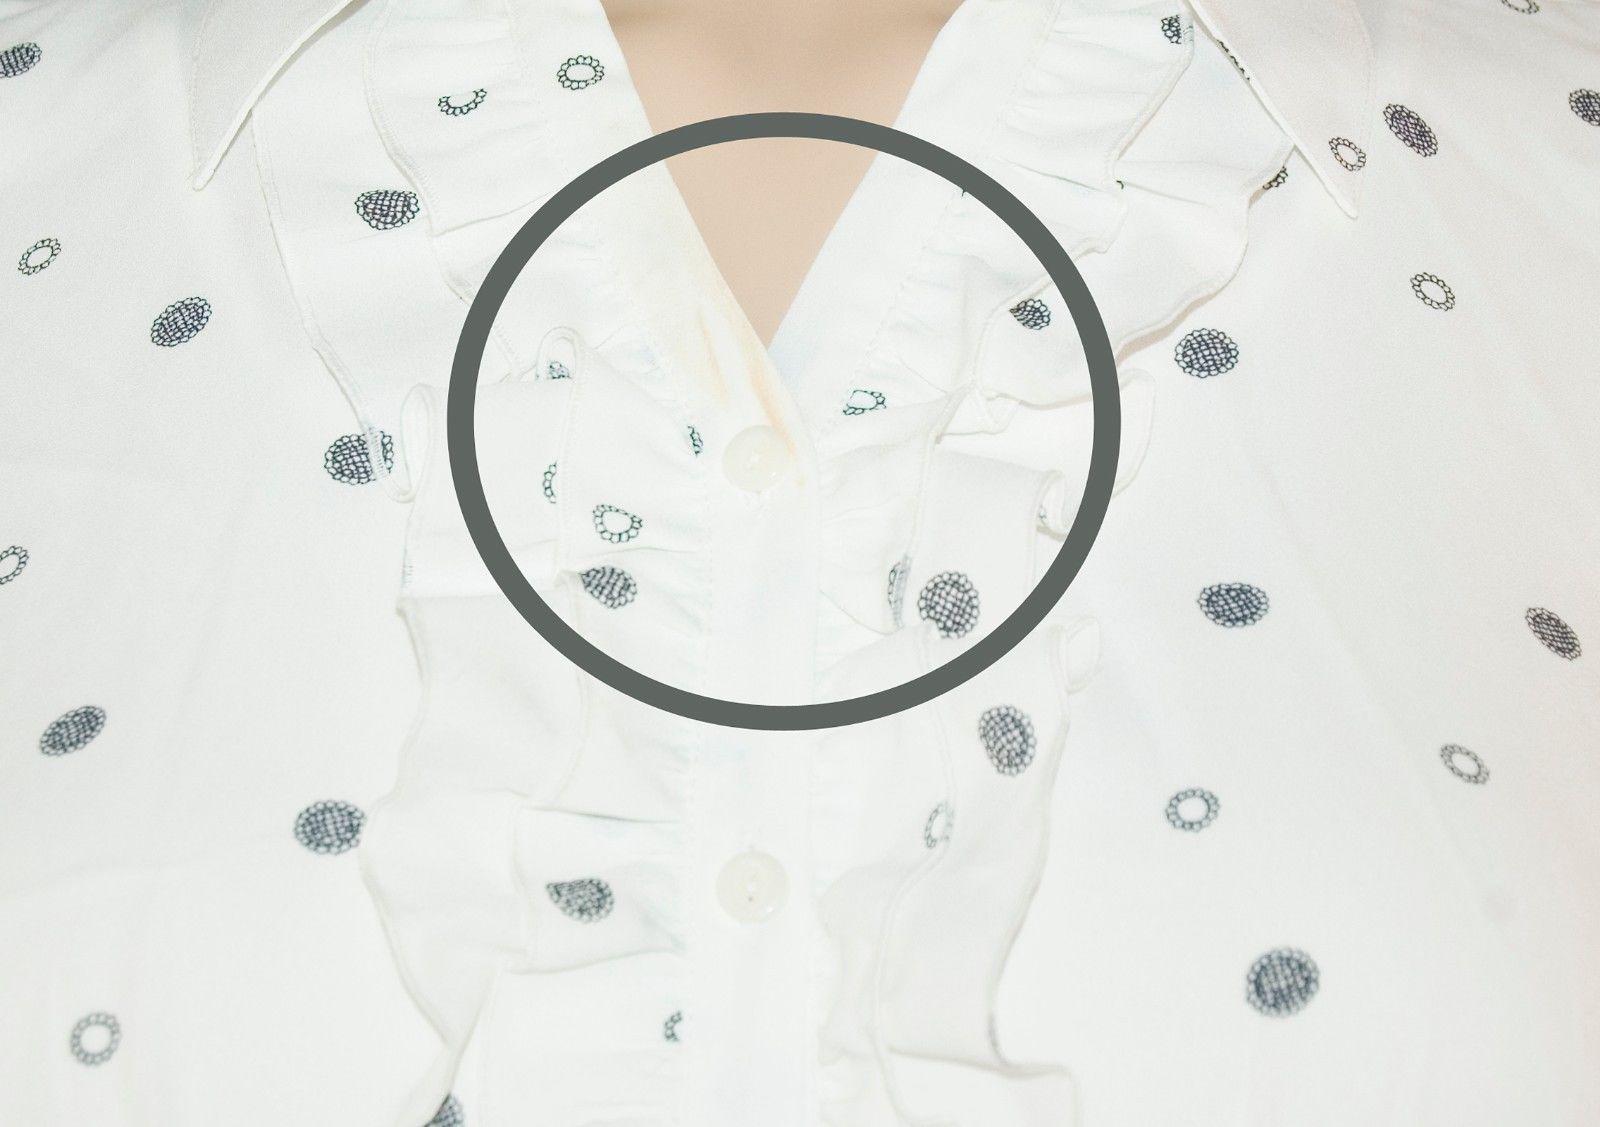 JM Collection Women's Button Down 2-Piece Blouse Size 18 White Polka Dots $44